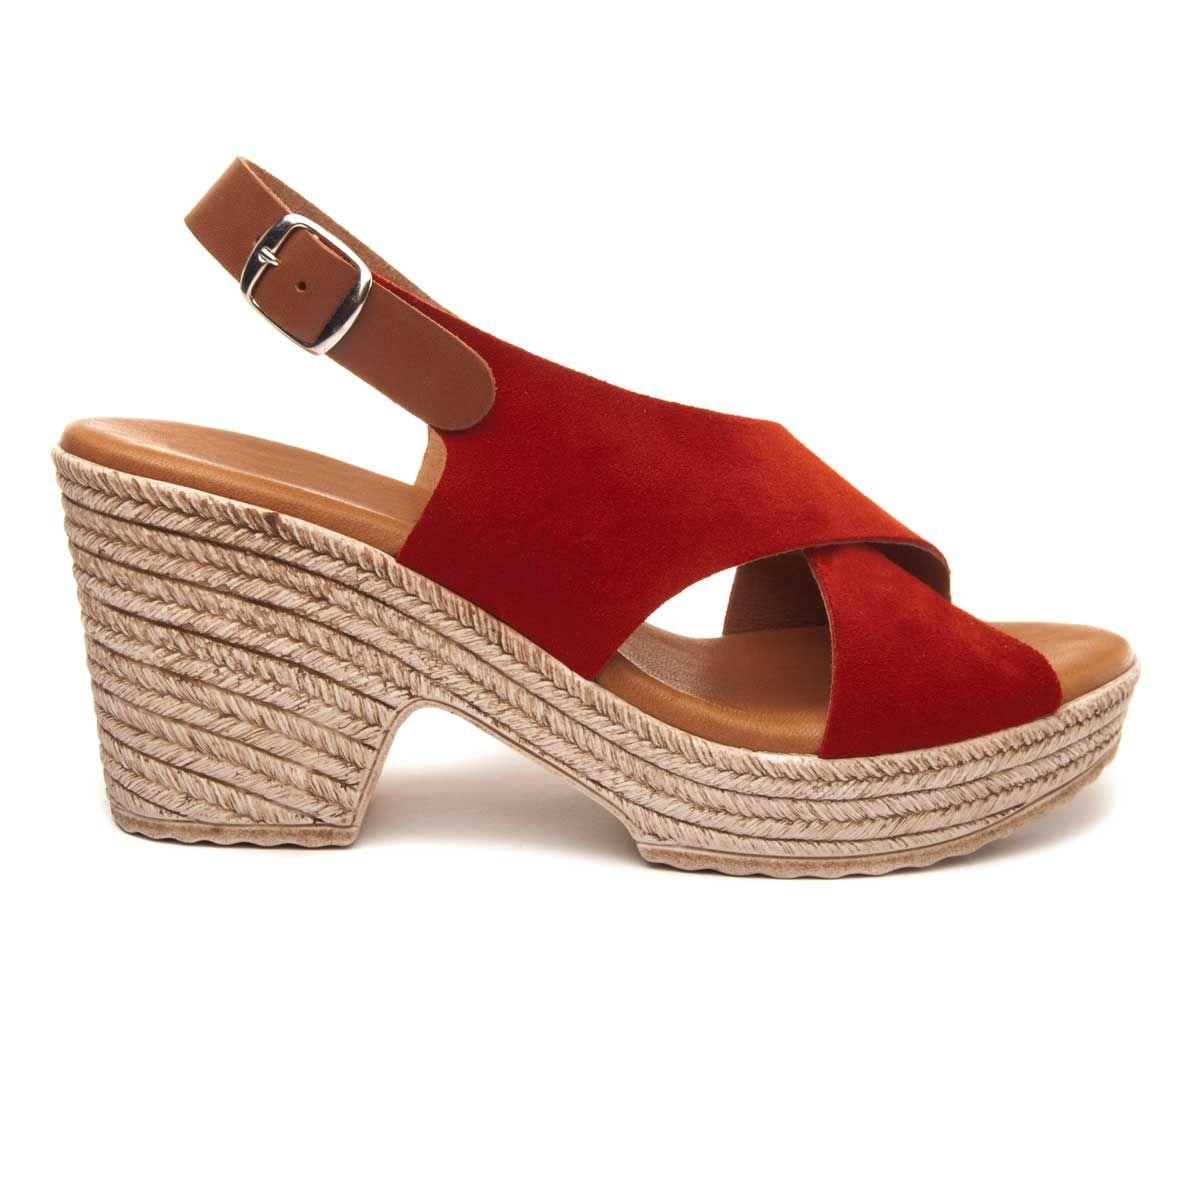 Purapiel Platform Sandal in Red